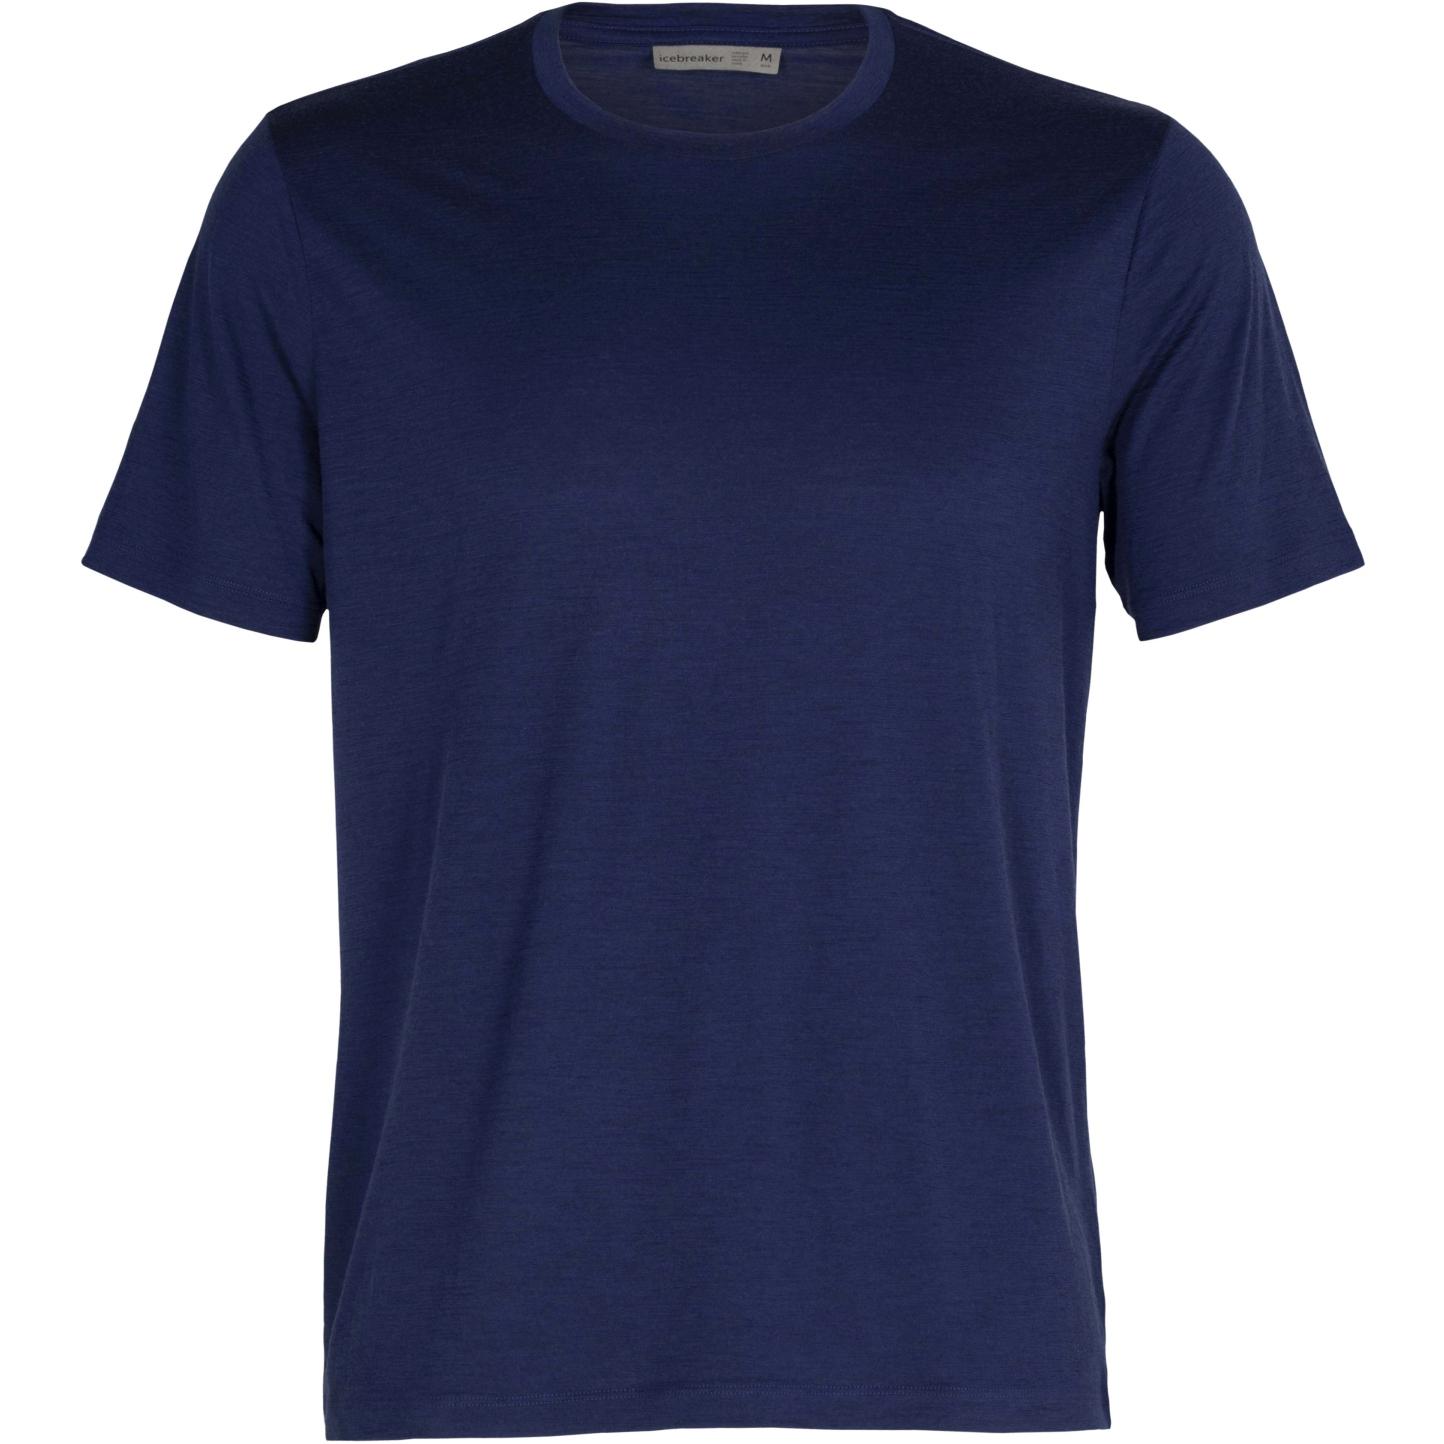 Produktbild von Icebreaker Tech Lite II Herren T-Shirt - Royal Navy